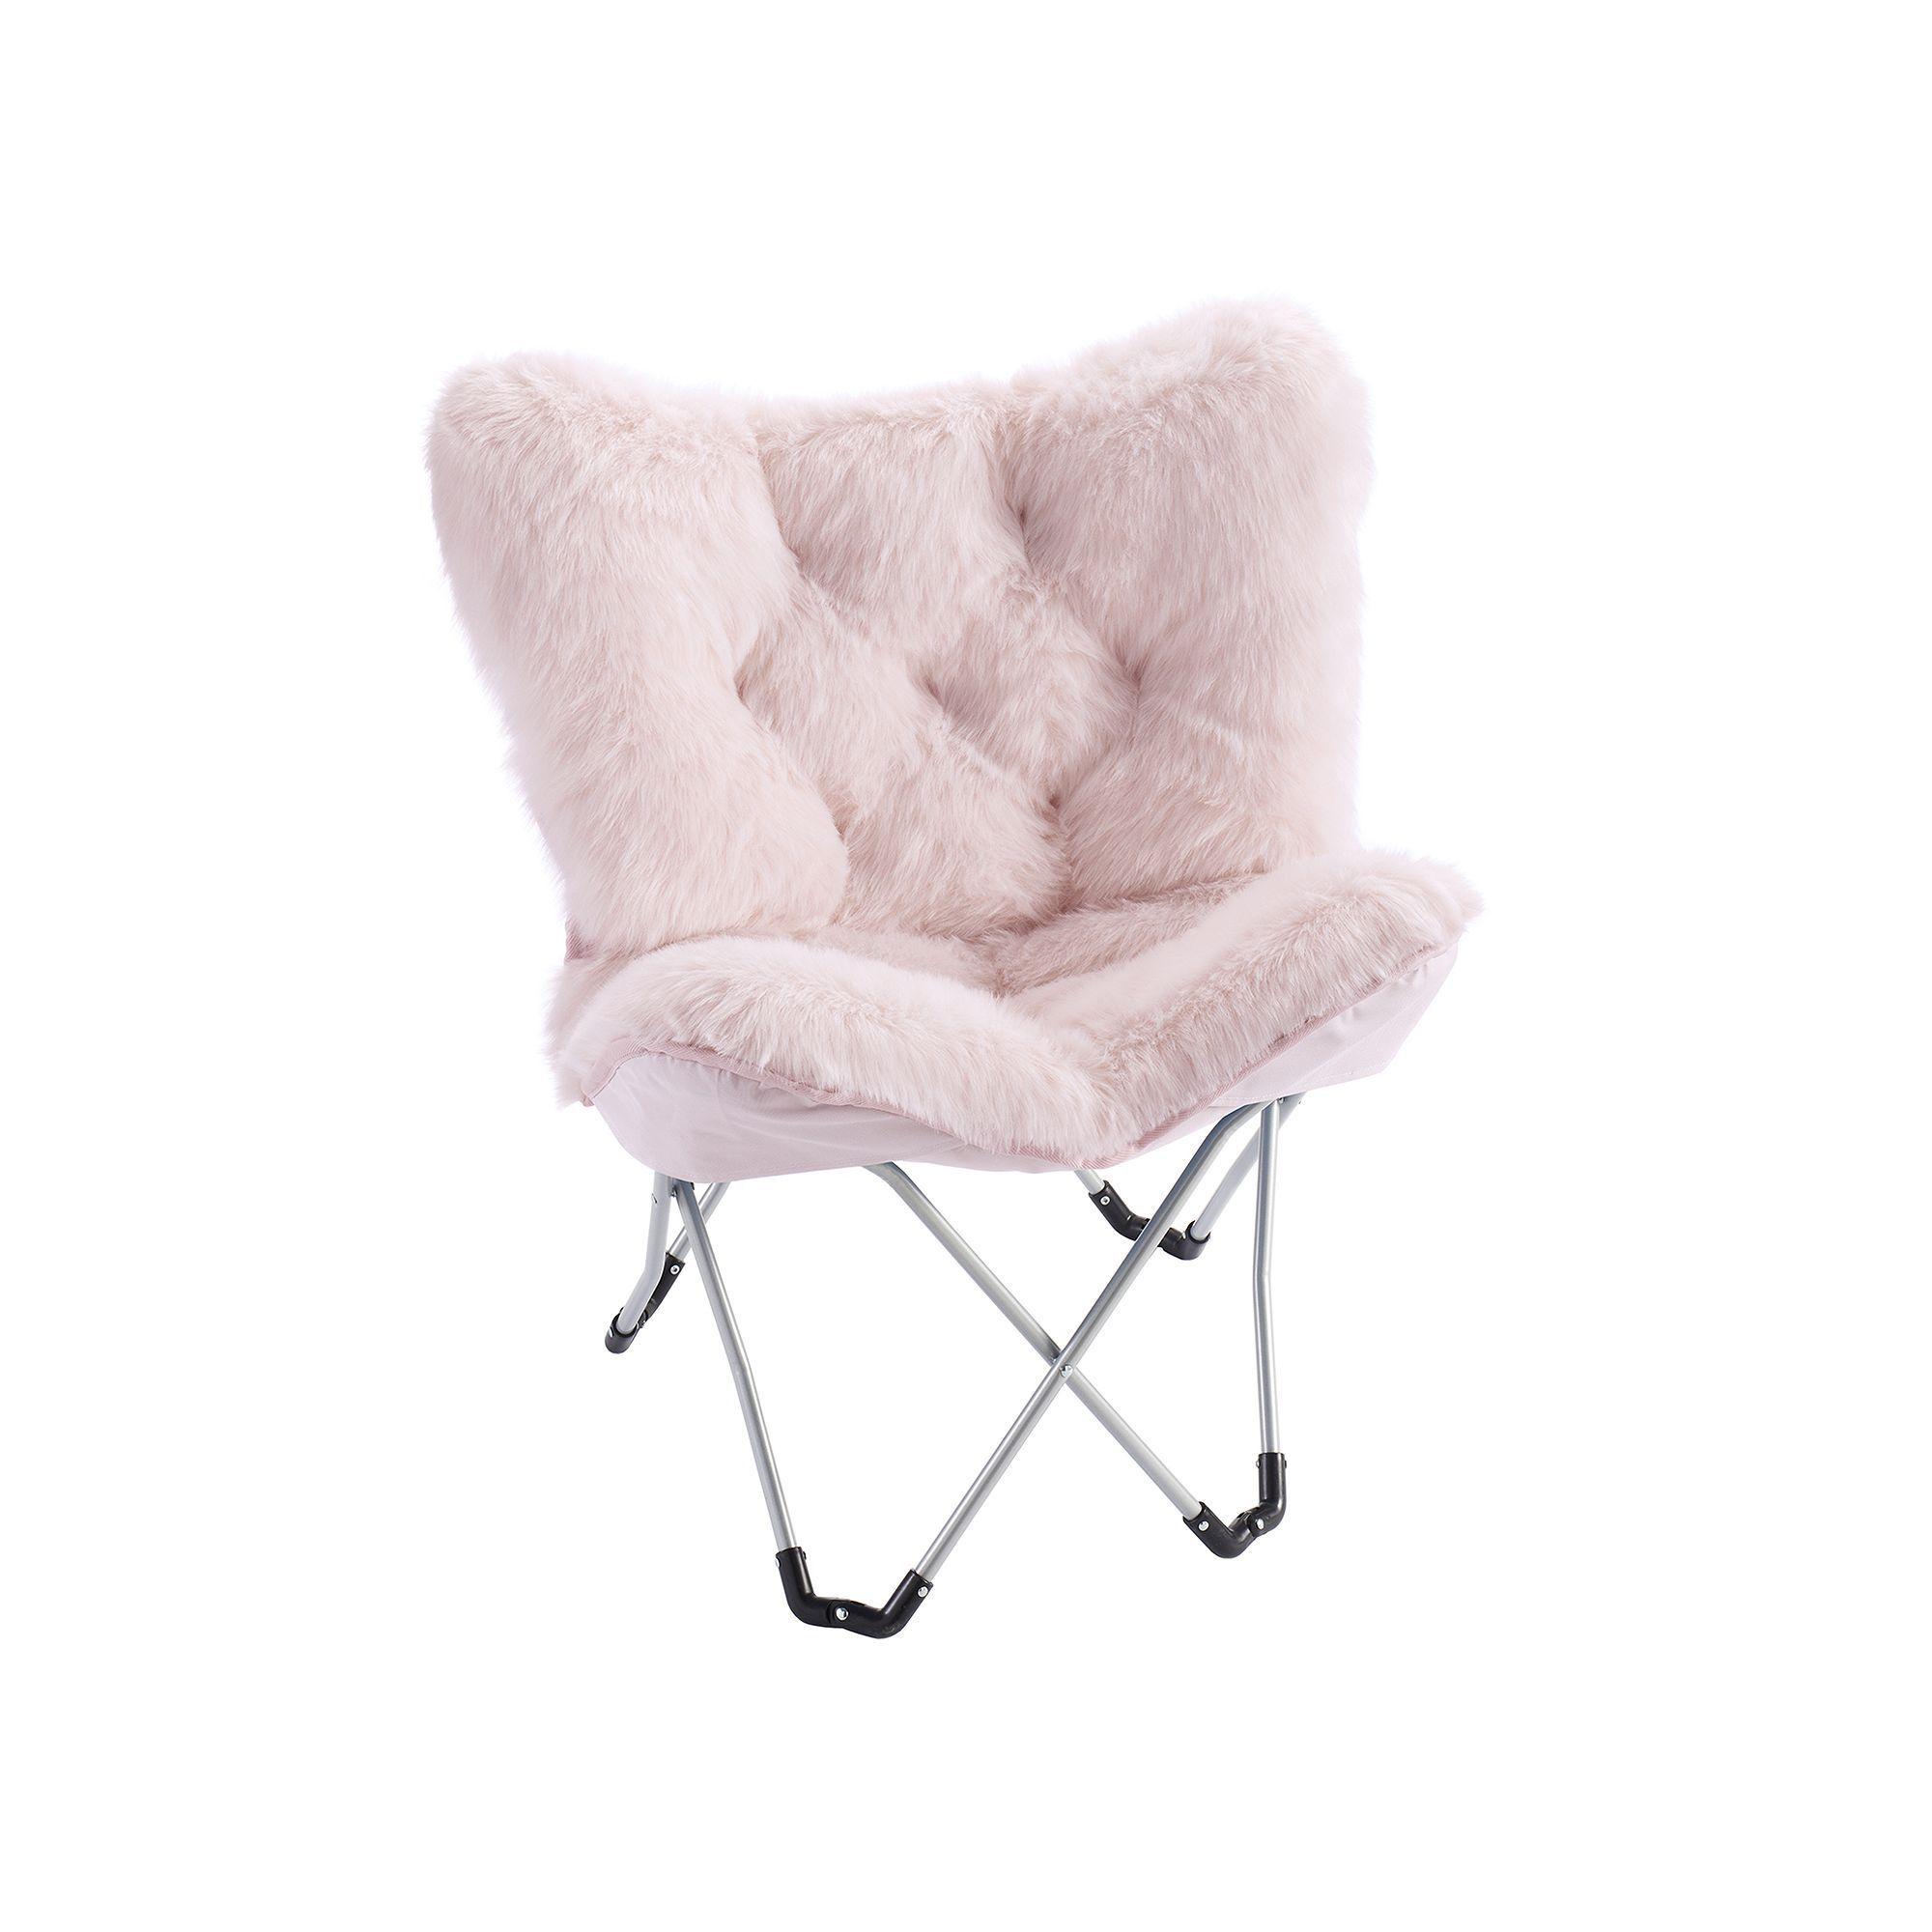 Simple By Design Memory Foam Butterfly Chair Brt Pink Butterfly